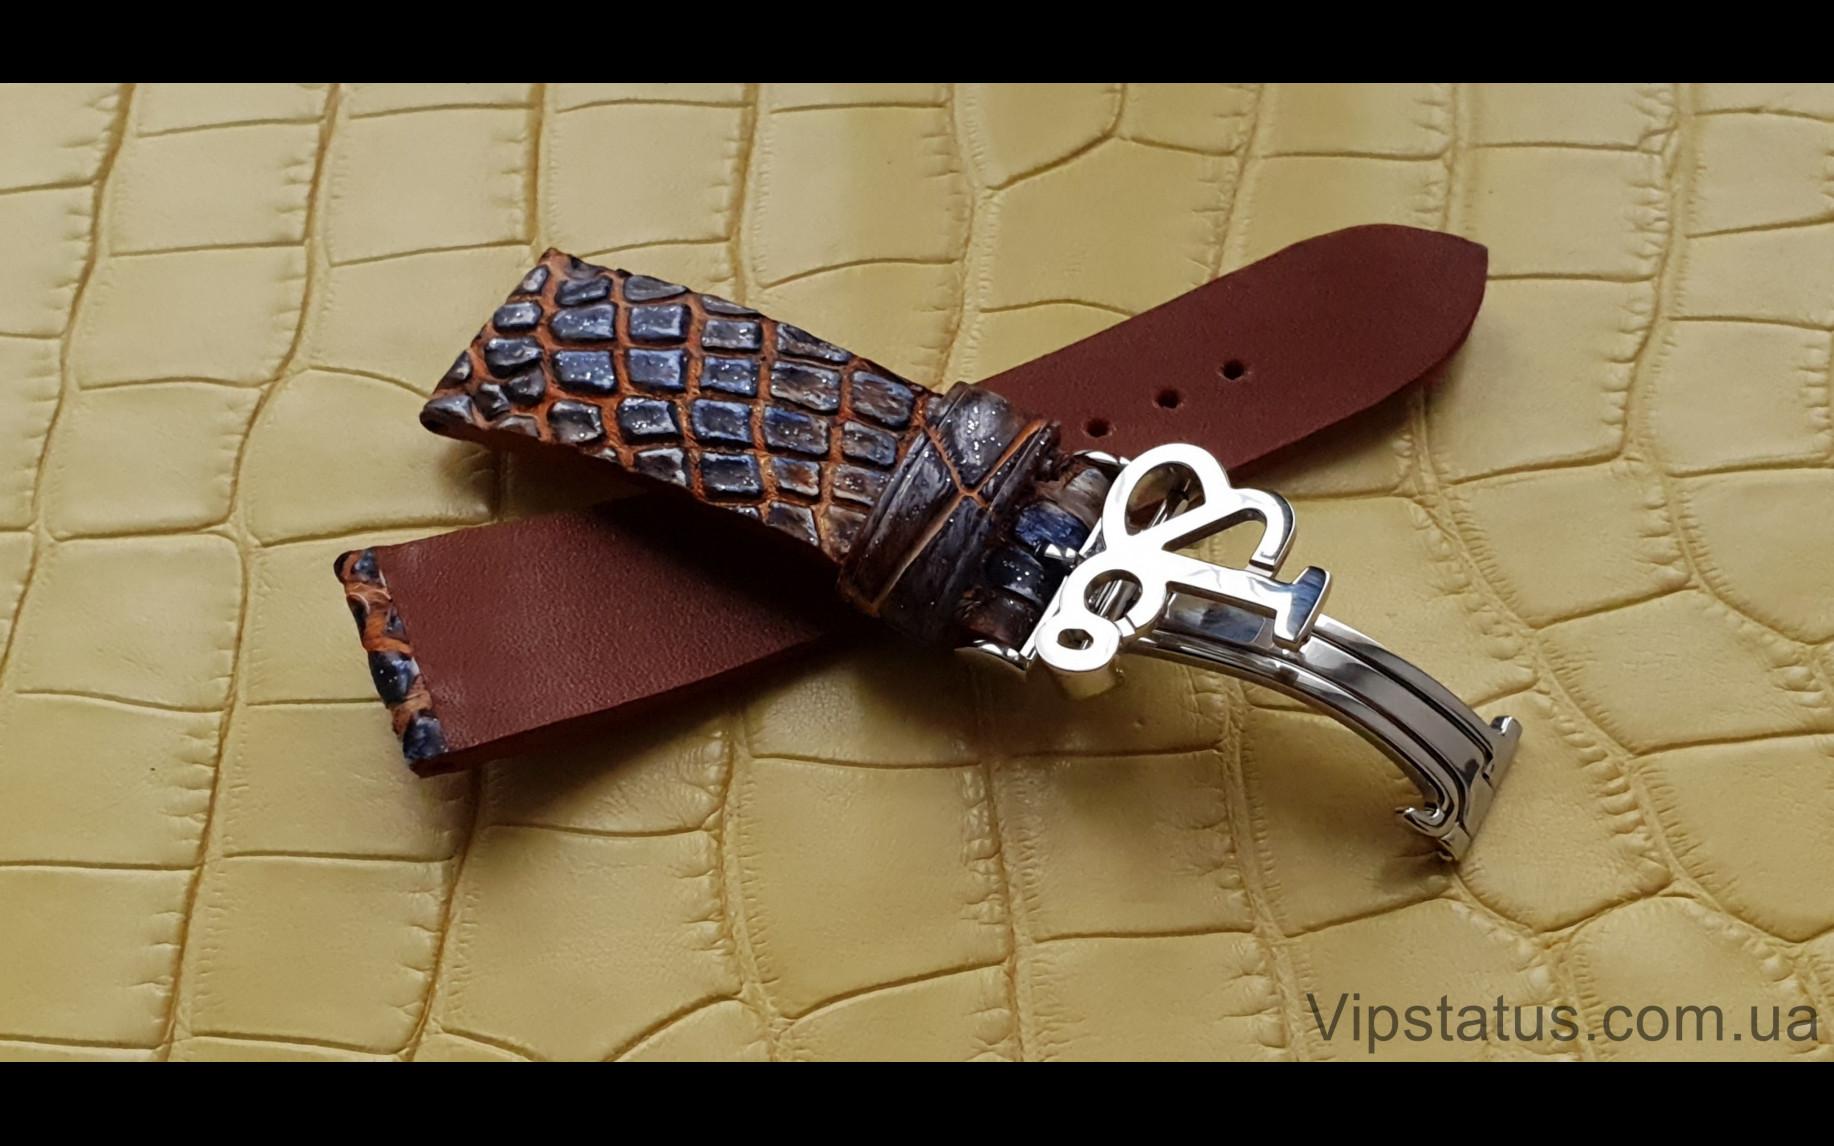 Elite Премиум ремешок для часов Jacob&Co кожа крокодила Premium Crocodile Strap for Jacob&Co watches image 5